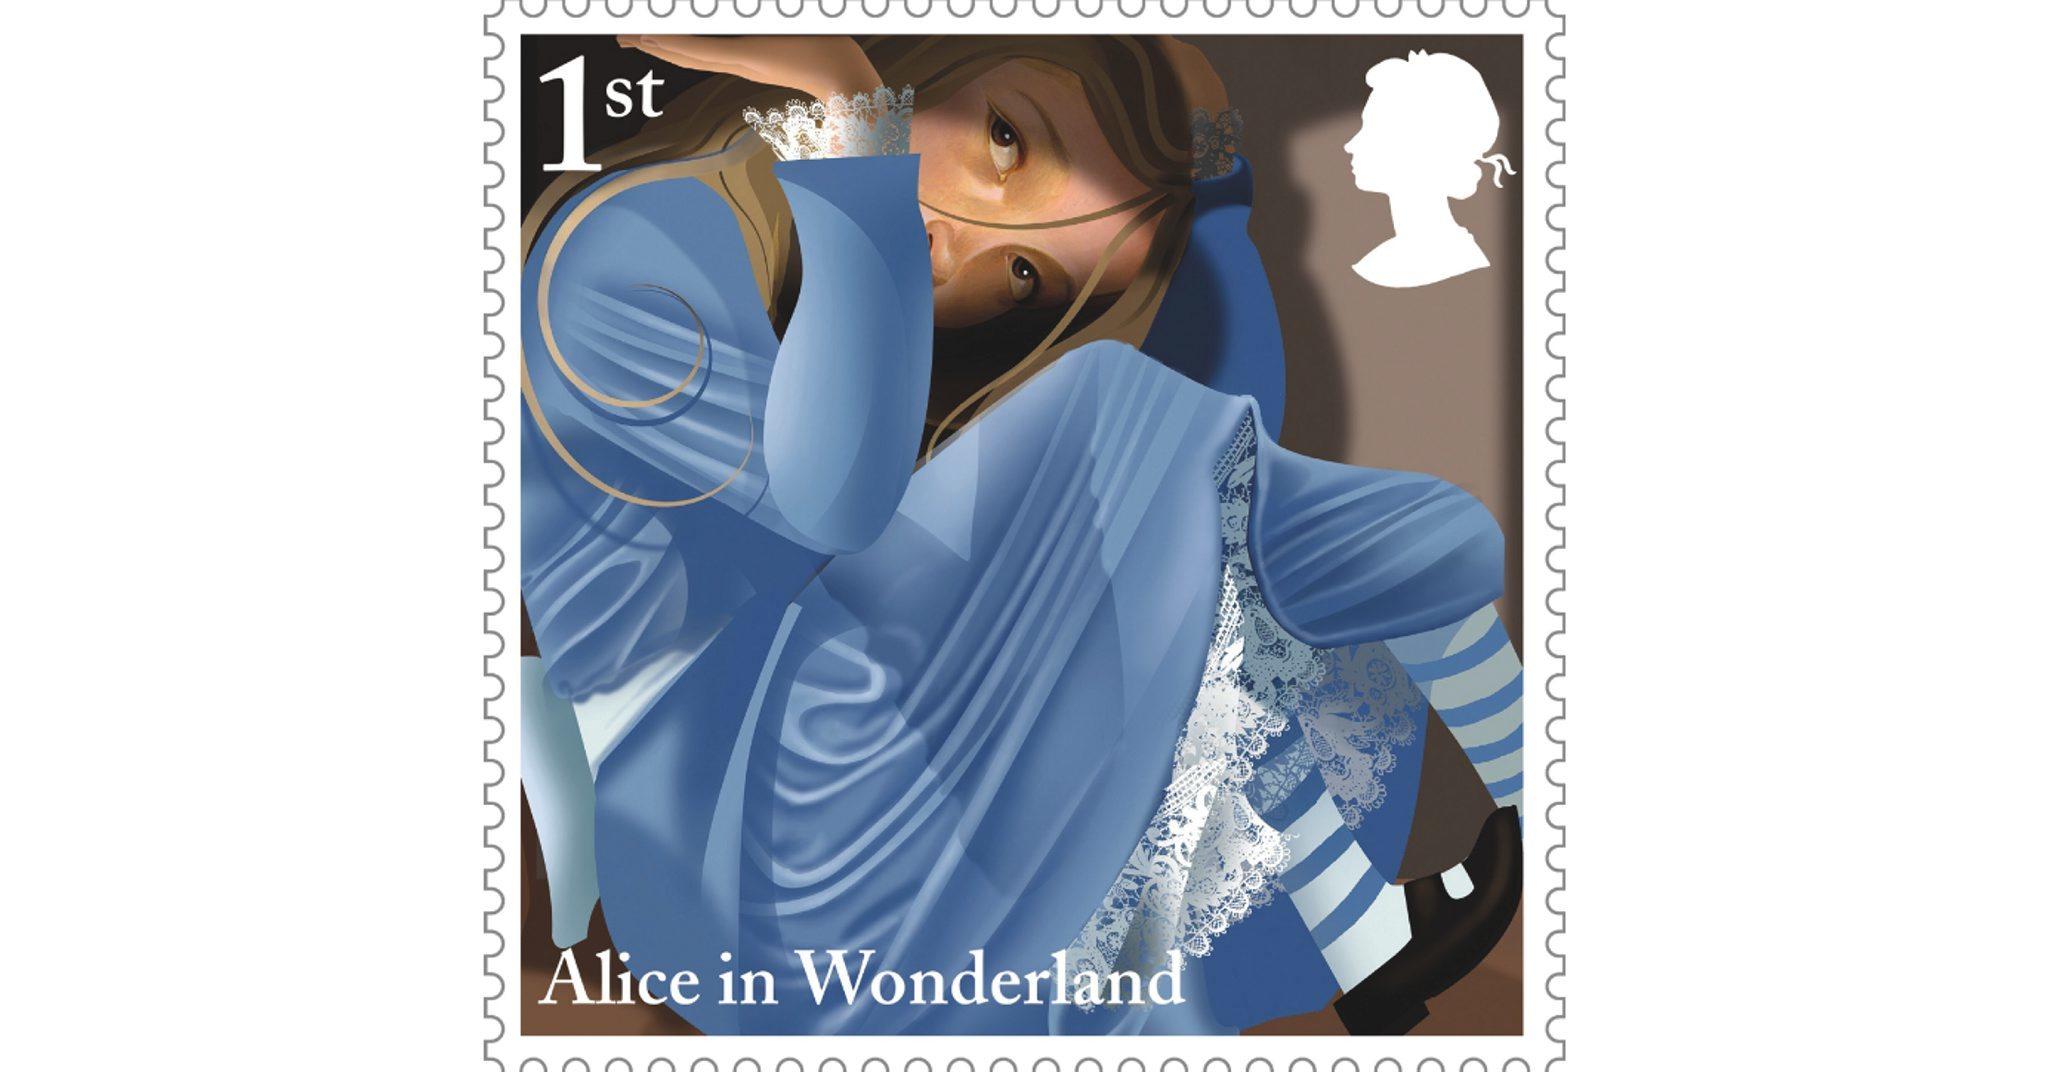 (Grahame Baker-Smith, 'Stamp Design', 2015 © Royal Mail Group Ltd)